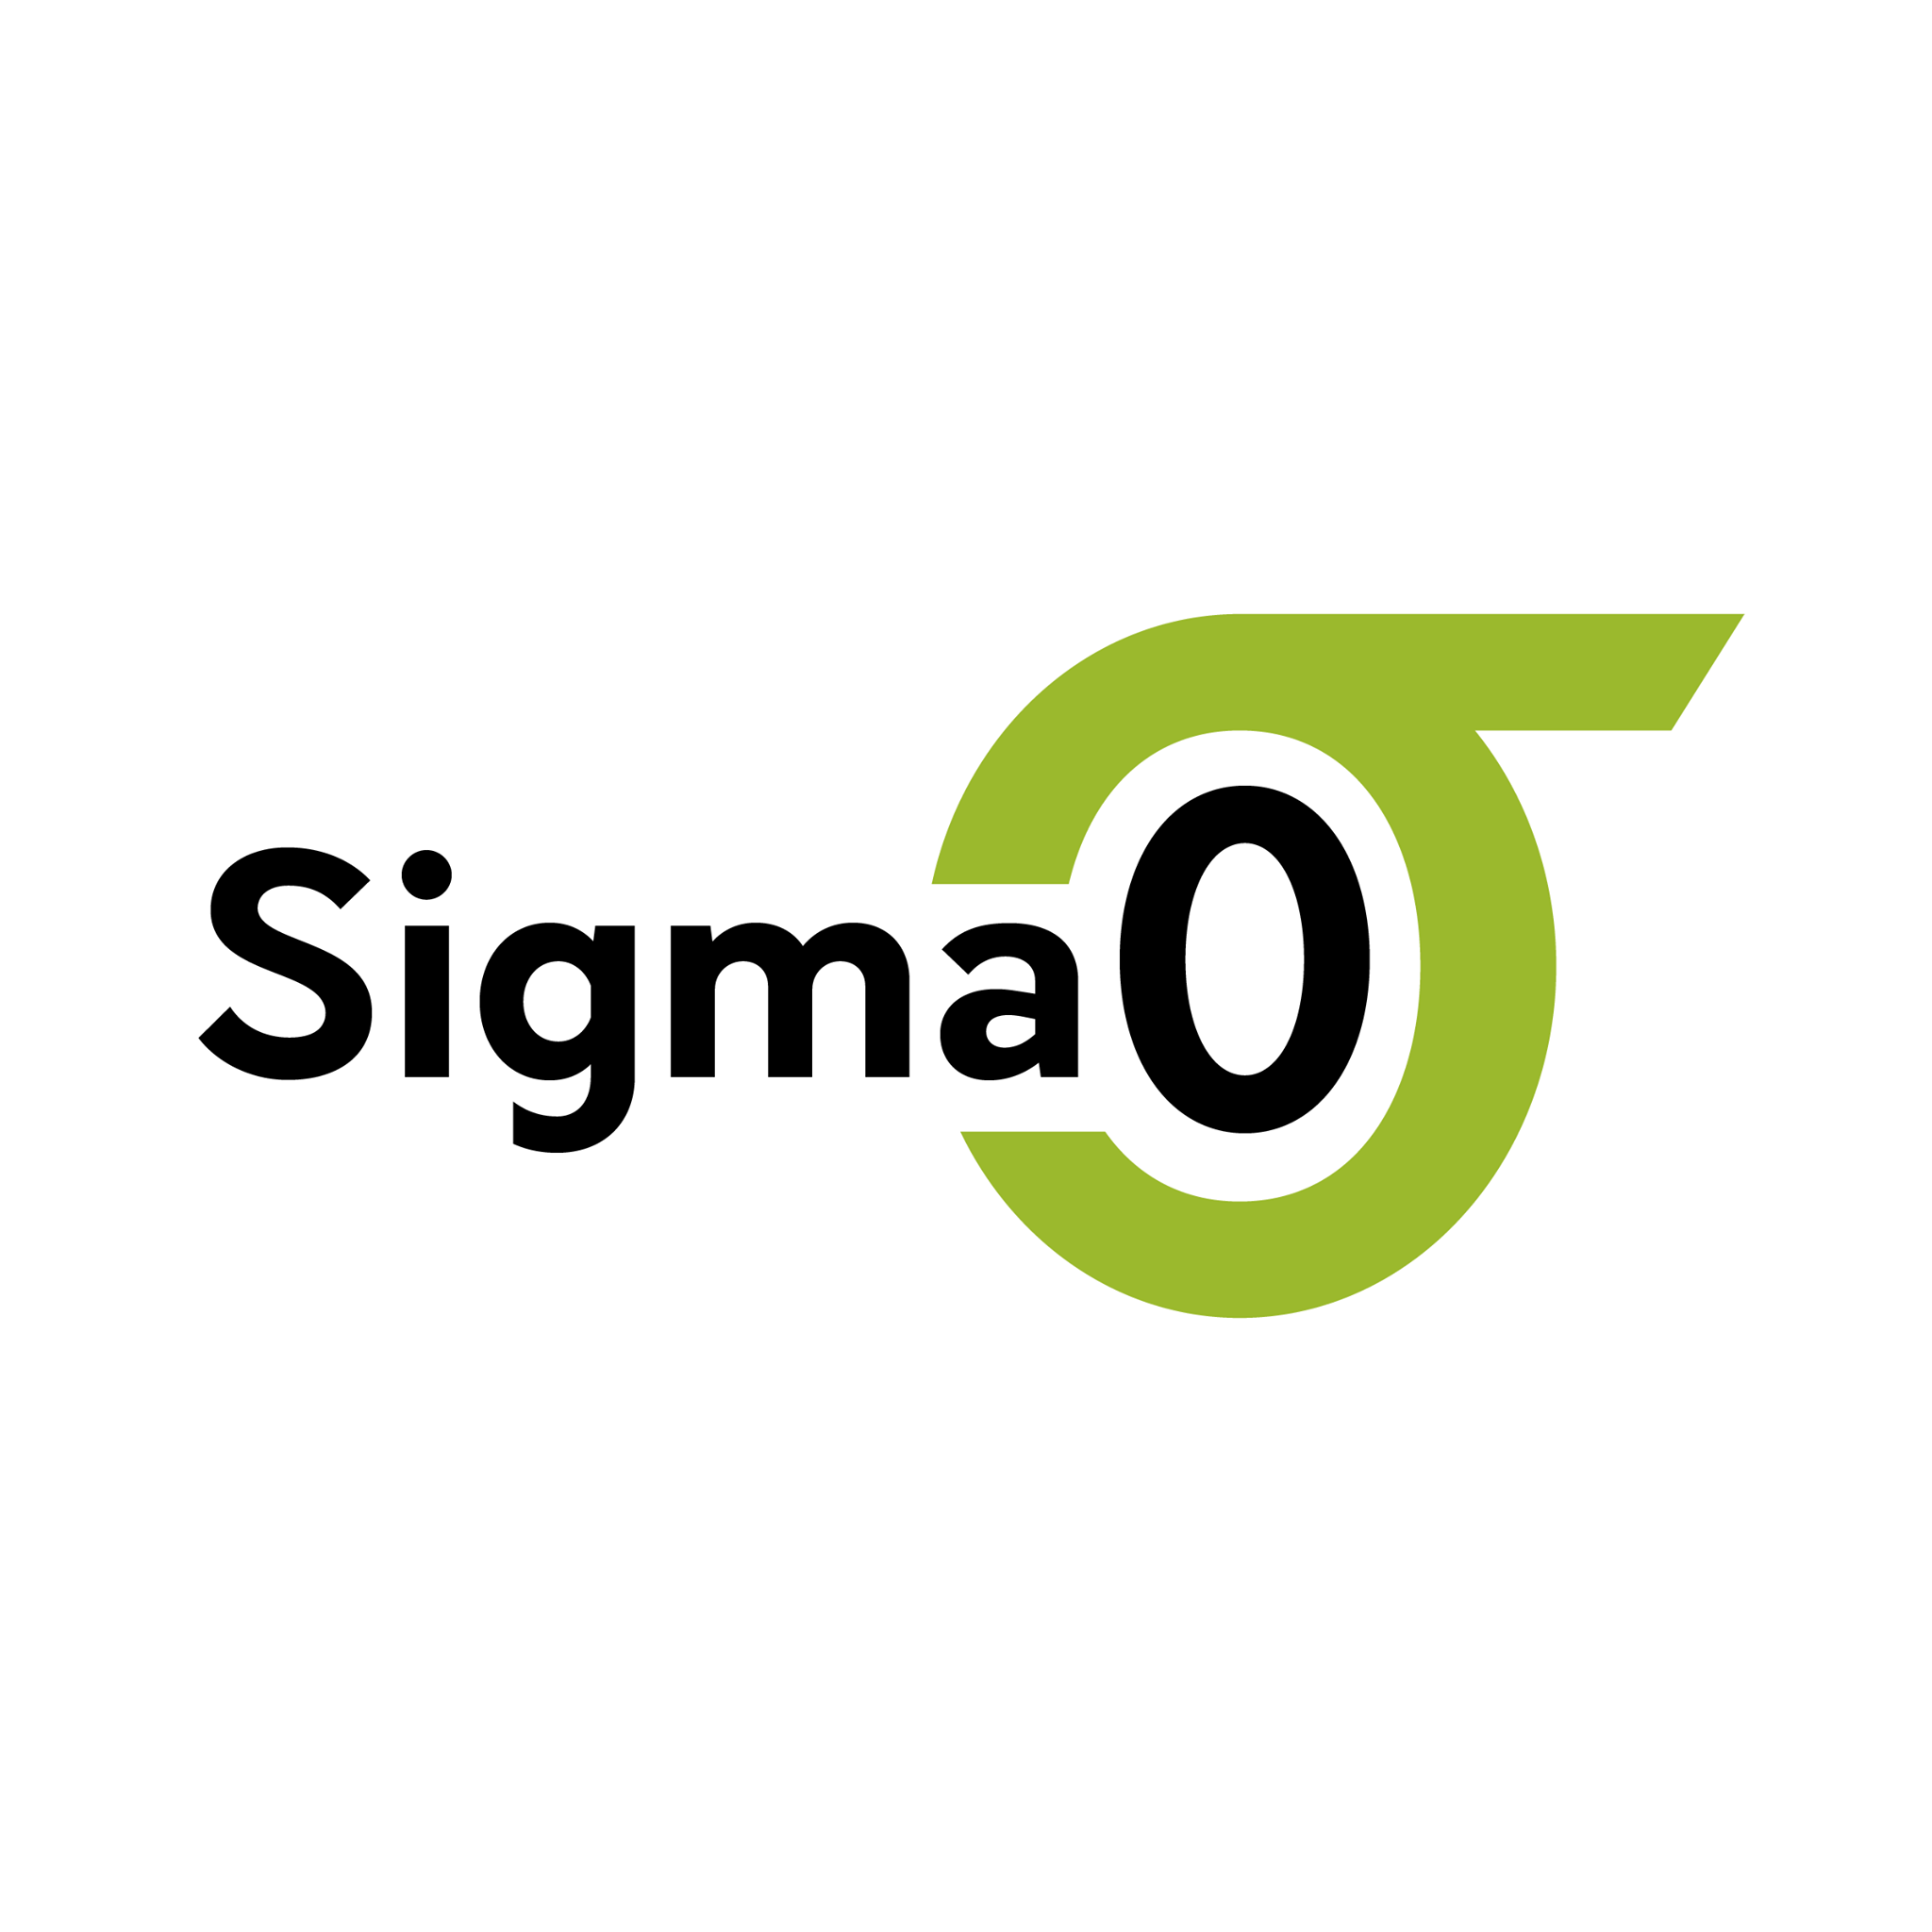 Sigma0 logo